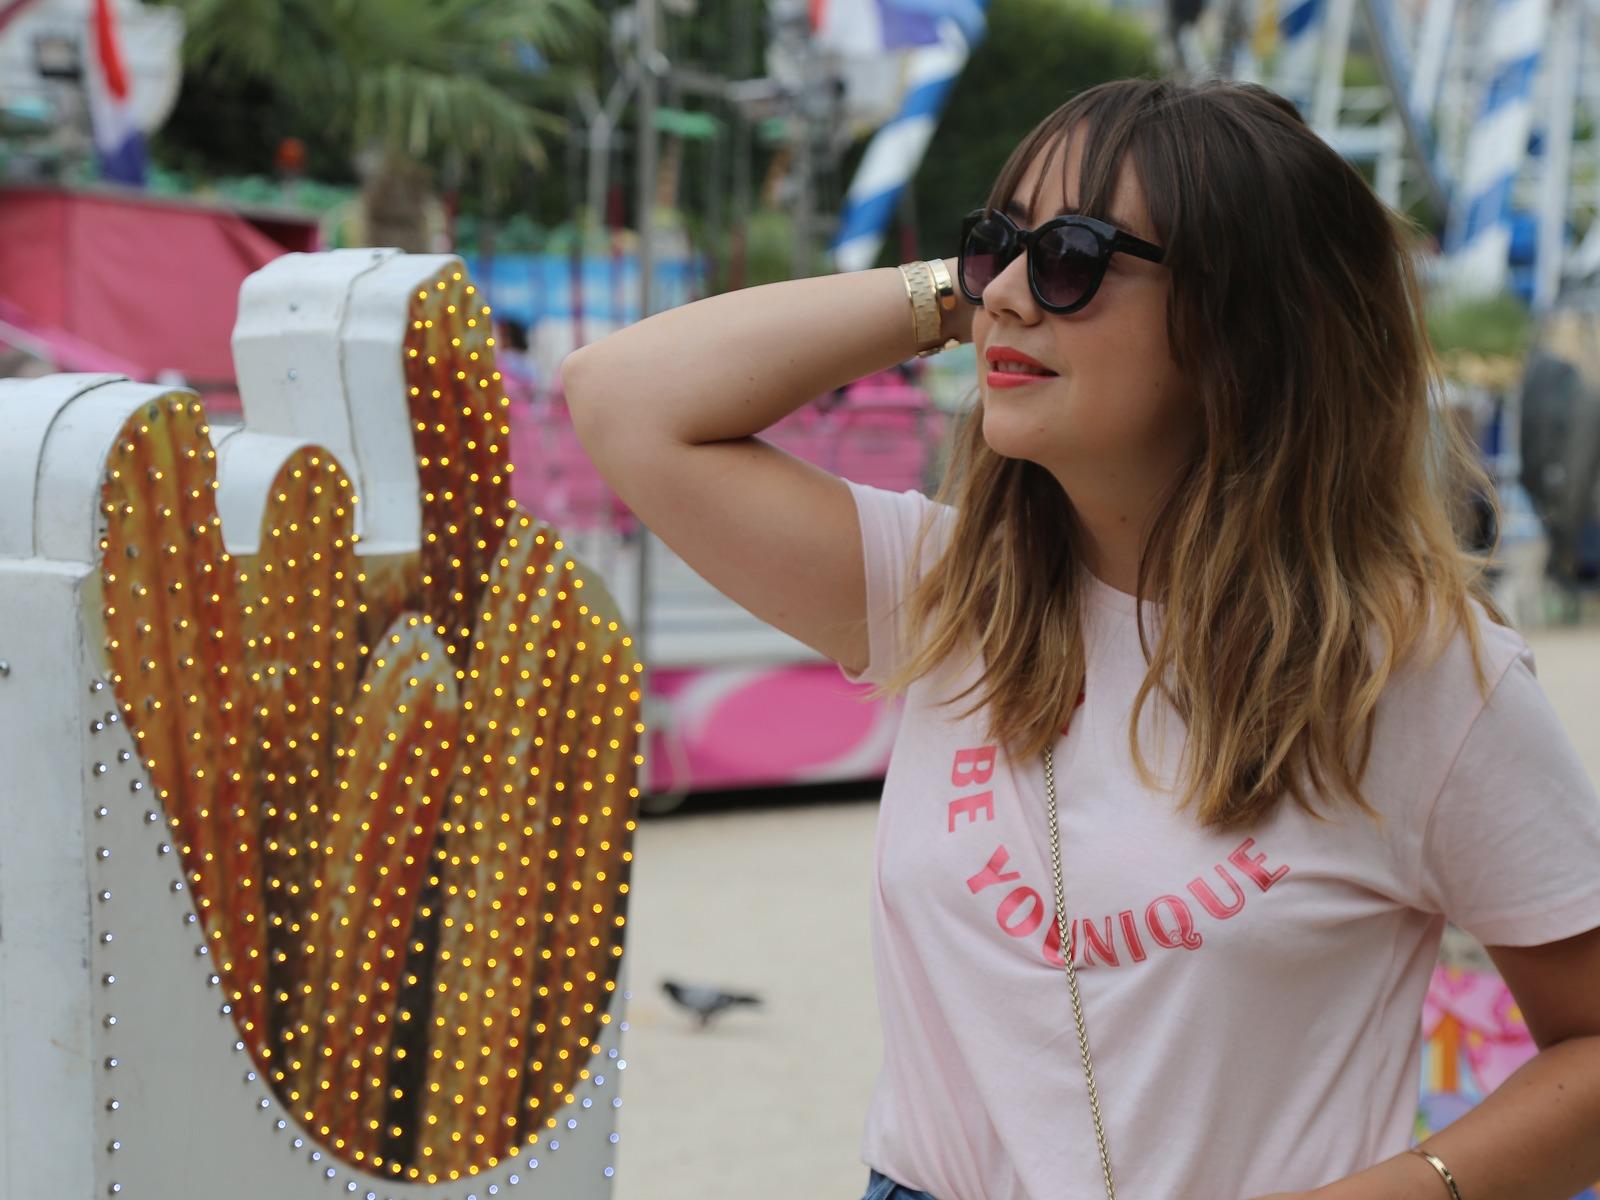 Blog mode femme Paris - Du style, Madame - streetstyle - fetes des Tuileries - mom jean - furla metropolis - stradivarius